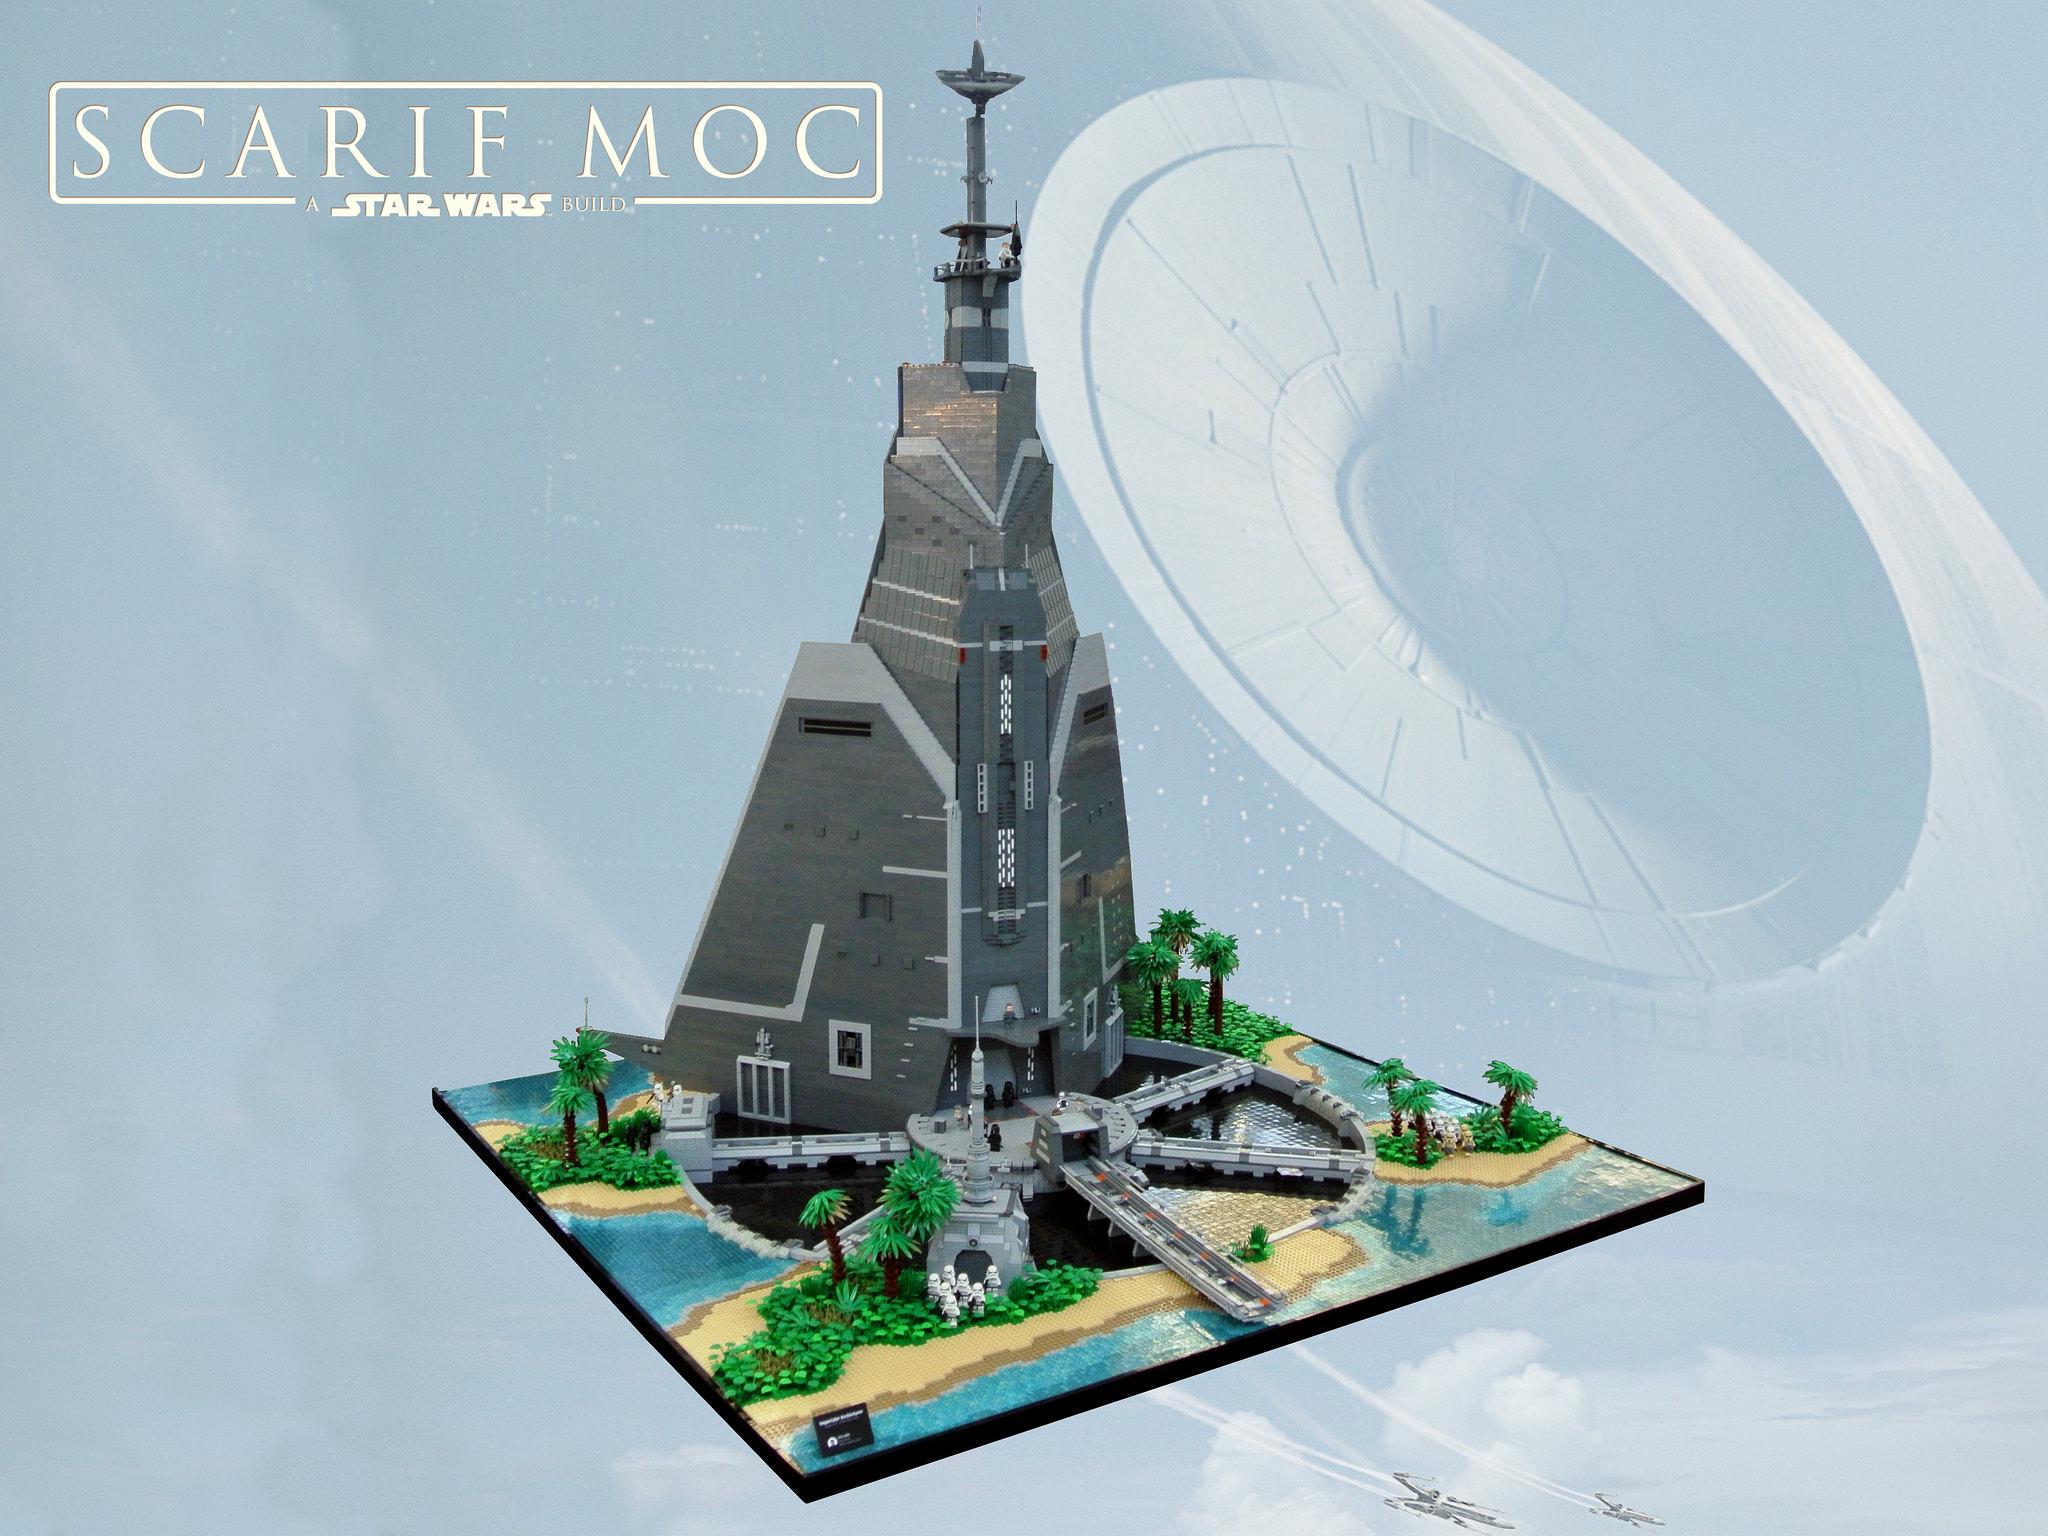 LEGO Rogue One Scarif Citadel de Paul Trach